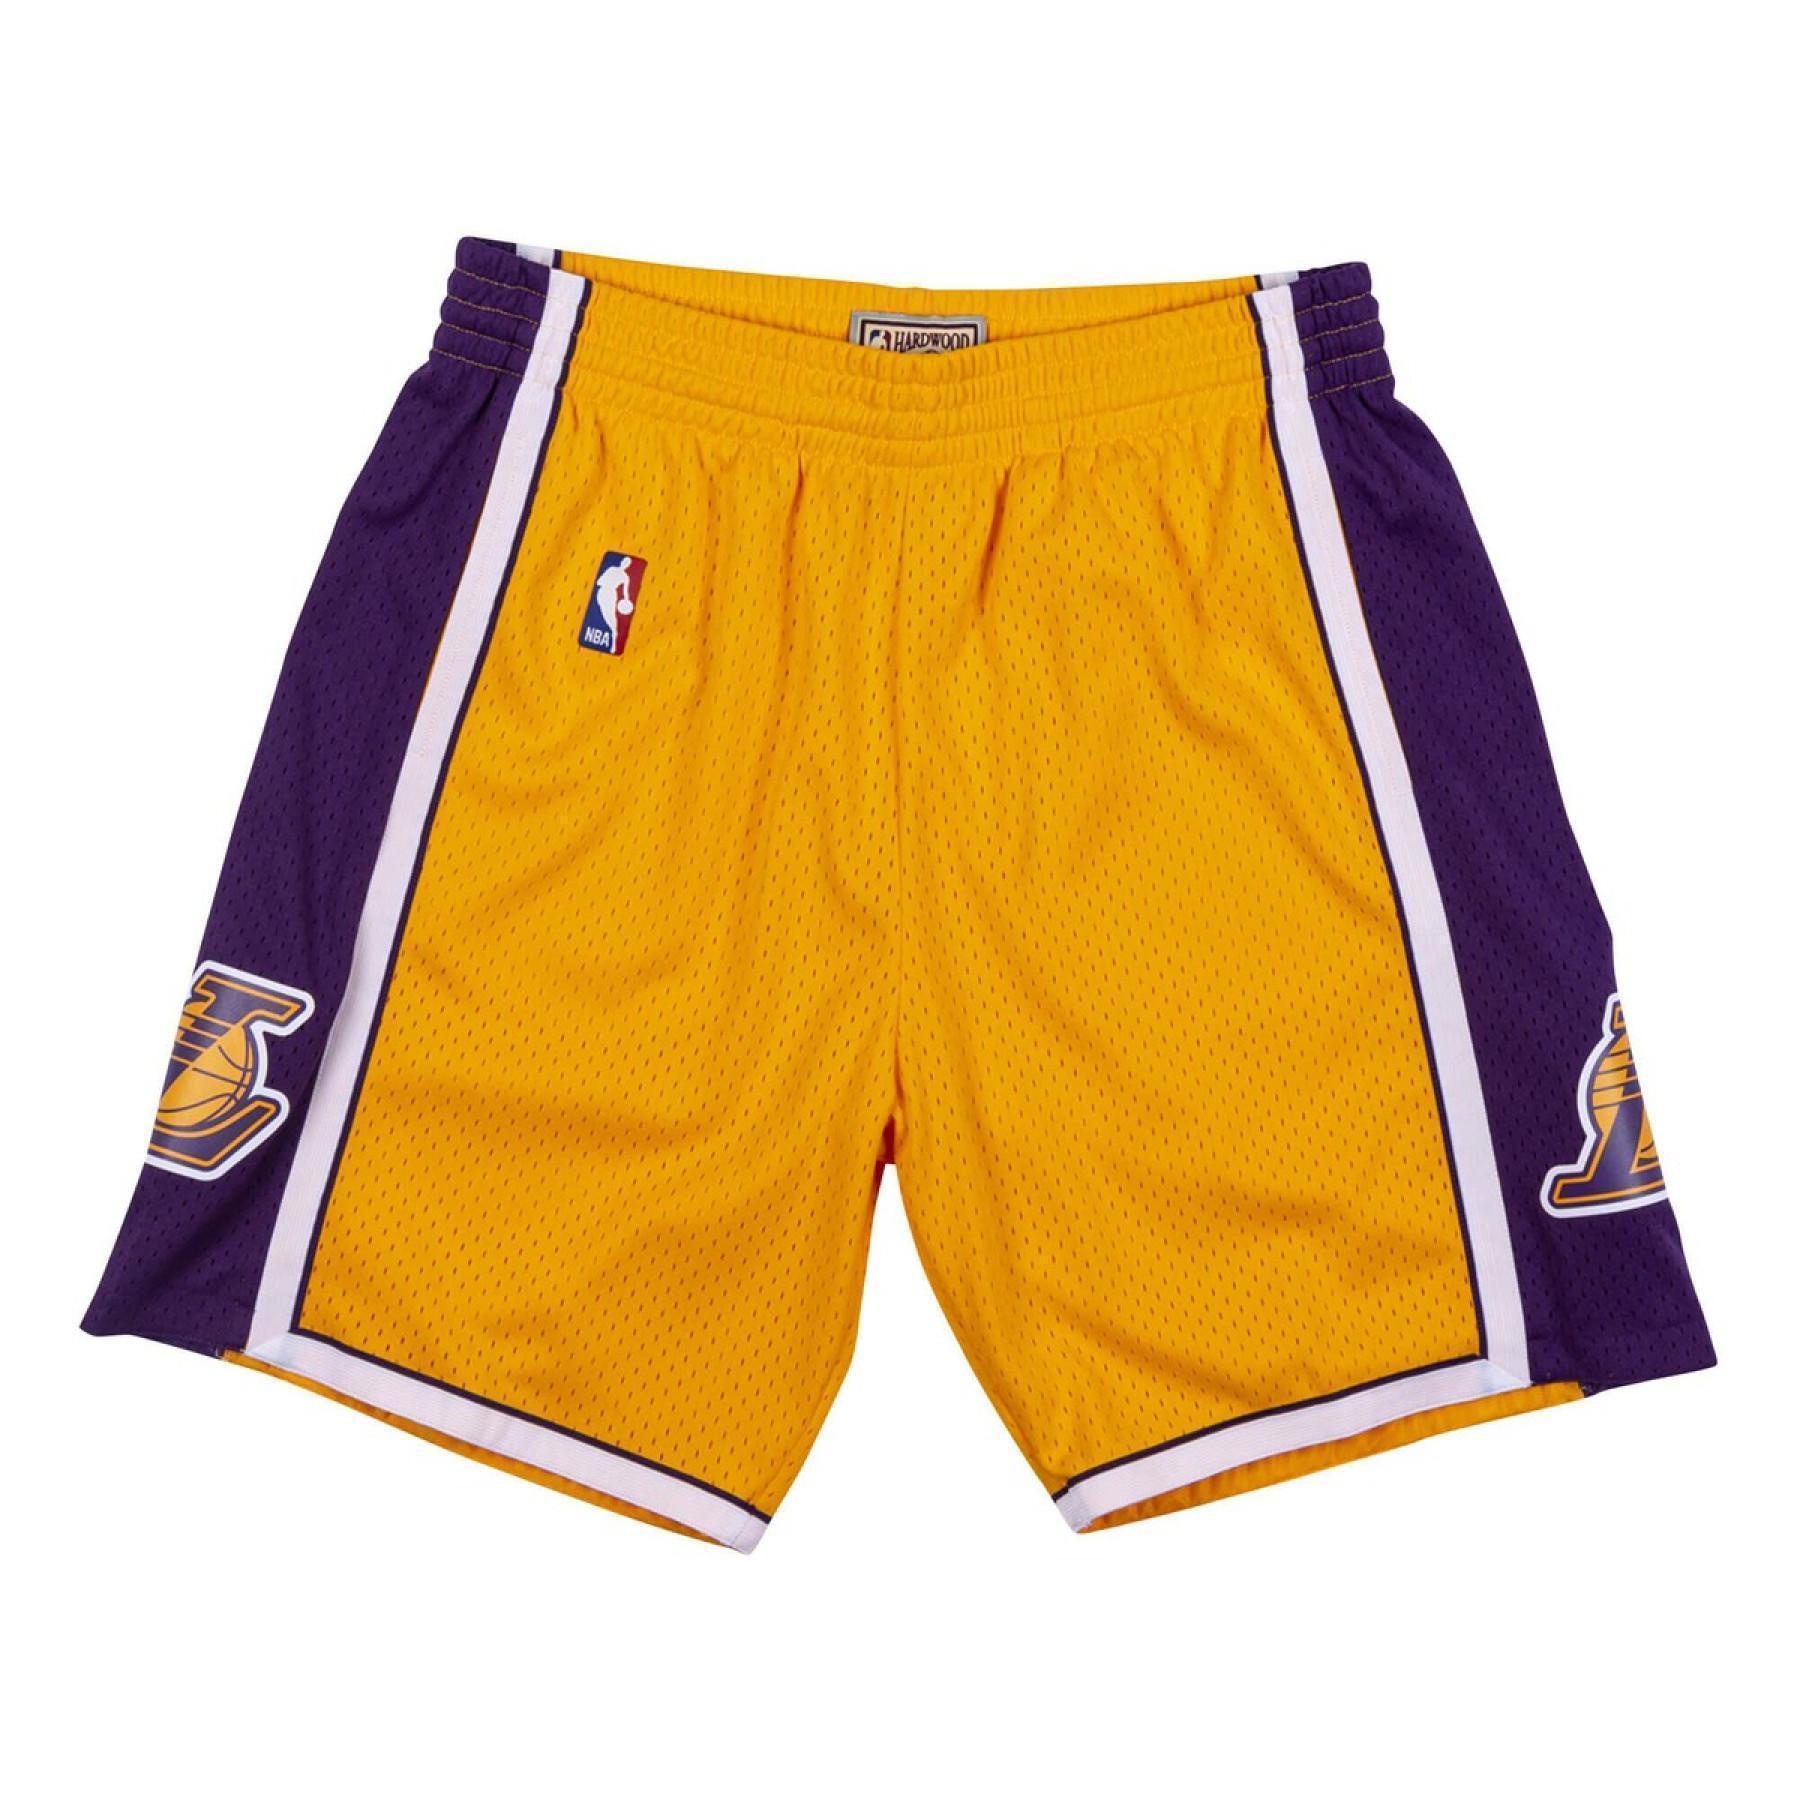 Los Angeles Lakers Short